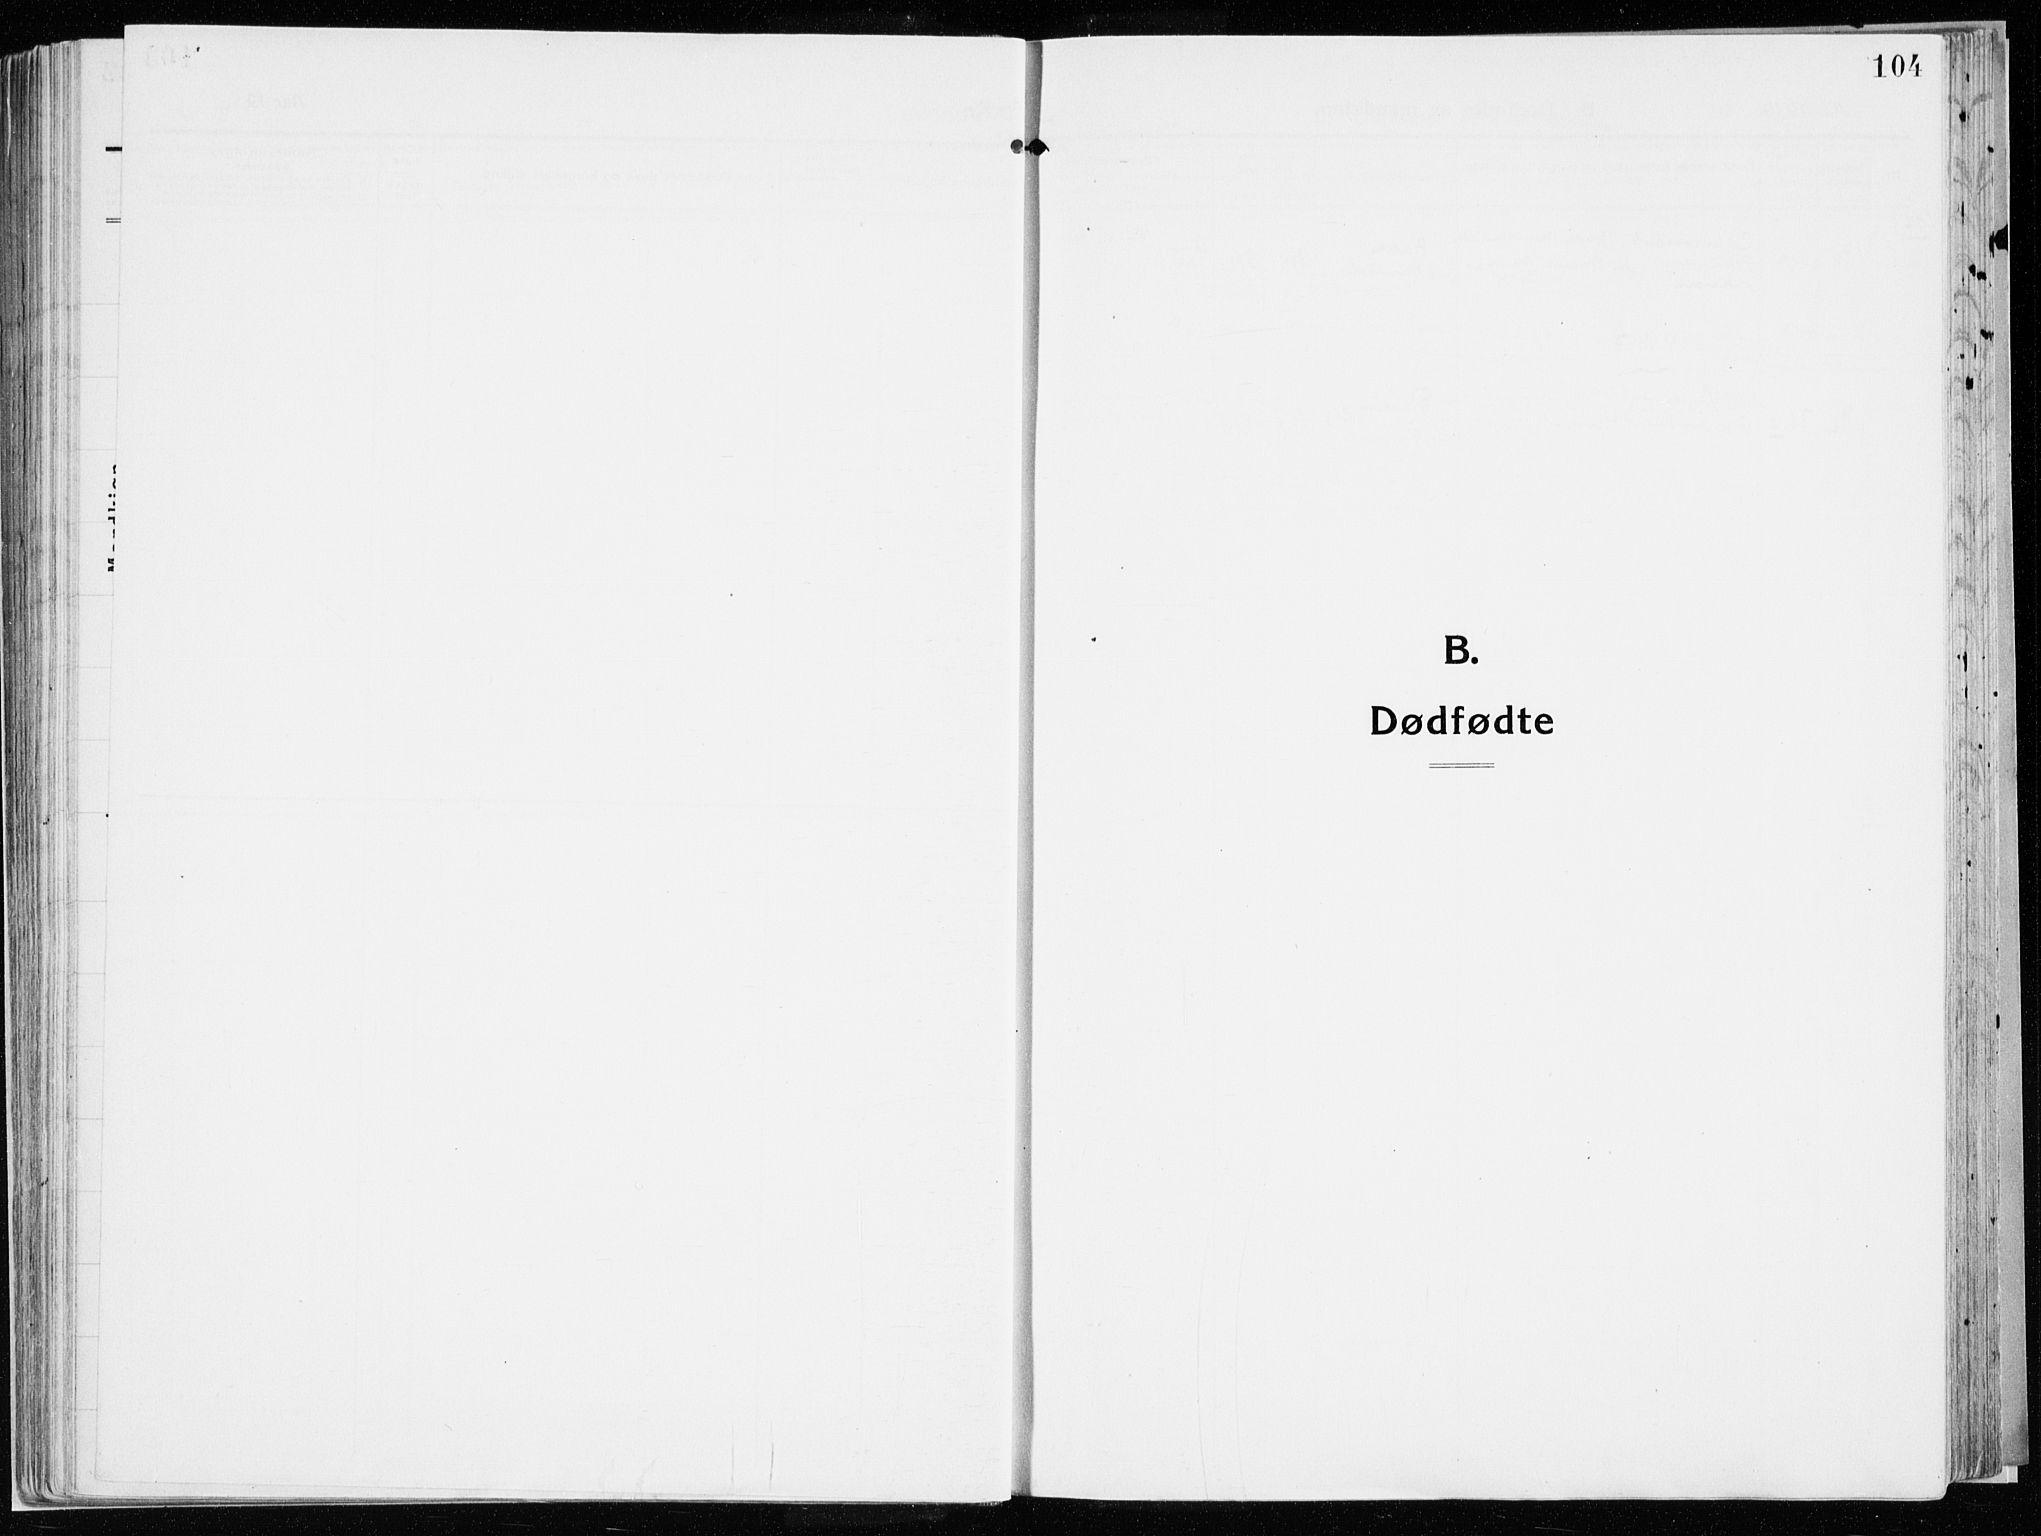 SAH, Vardal prestekontor, H/Ha/Haa/L0017: Ministerialbok nr. 17, 1915-1929, s. 104